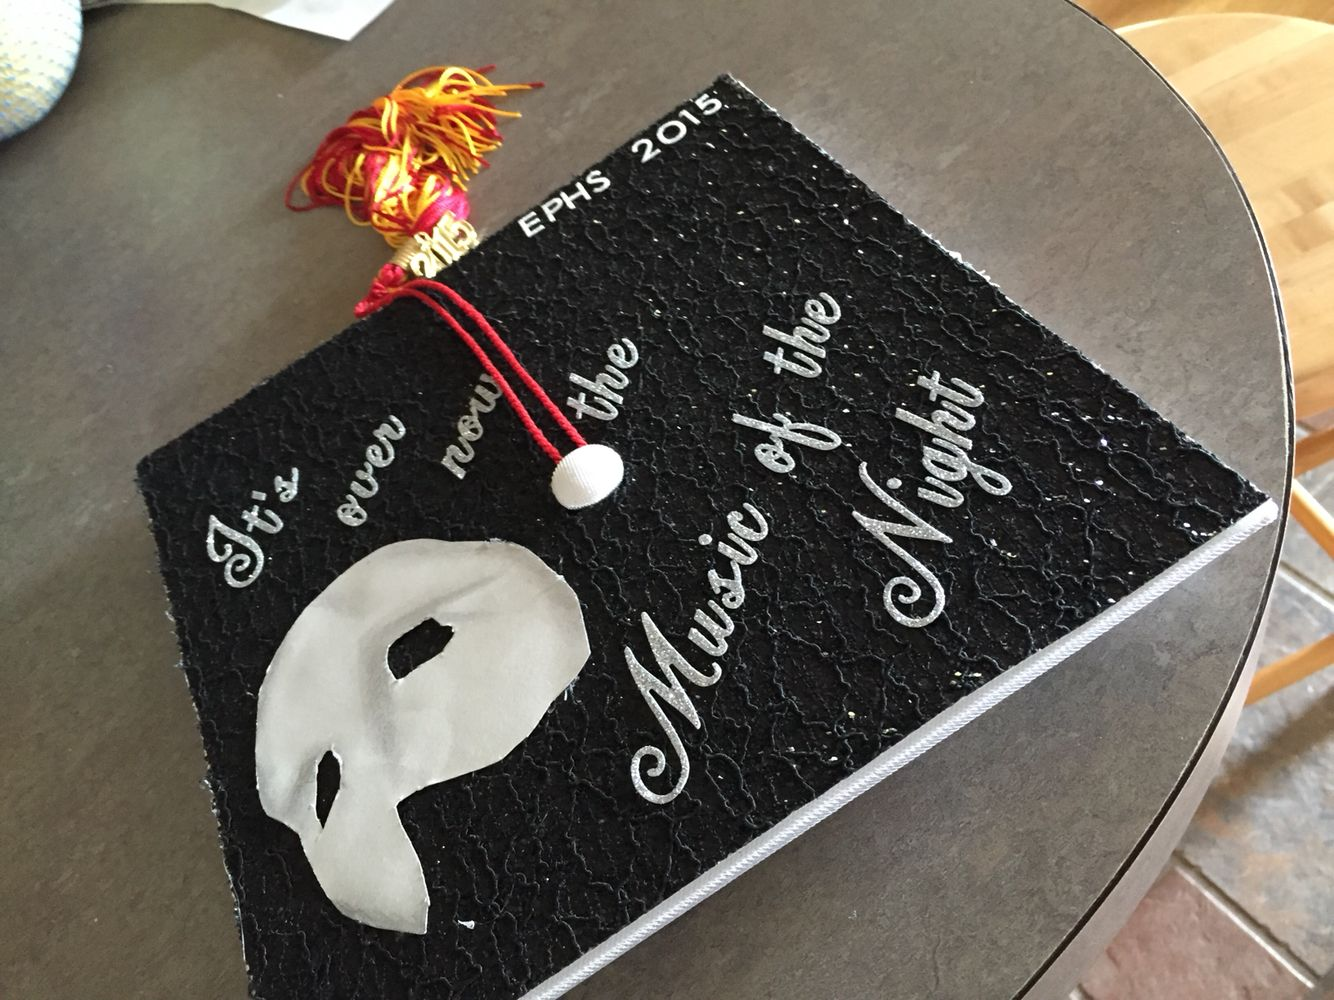 Decorating graduation cap ideas for teachers - Phantom Of The Opera Graduation Cap